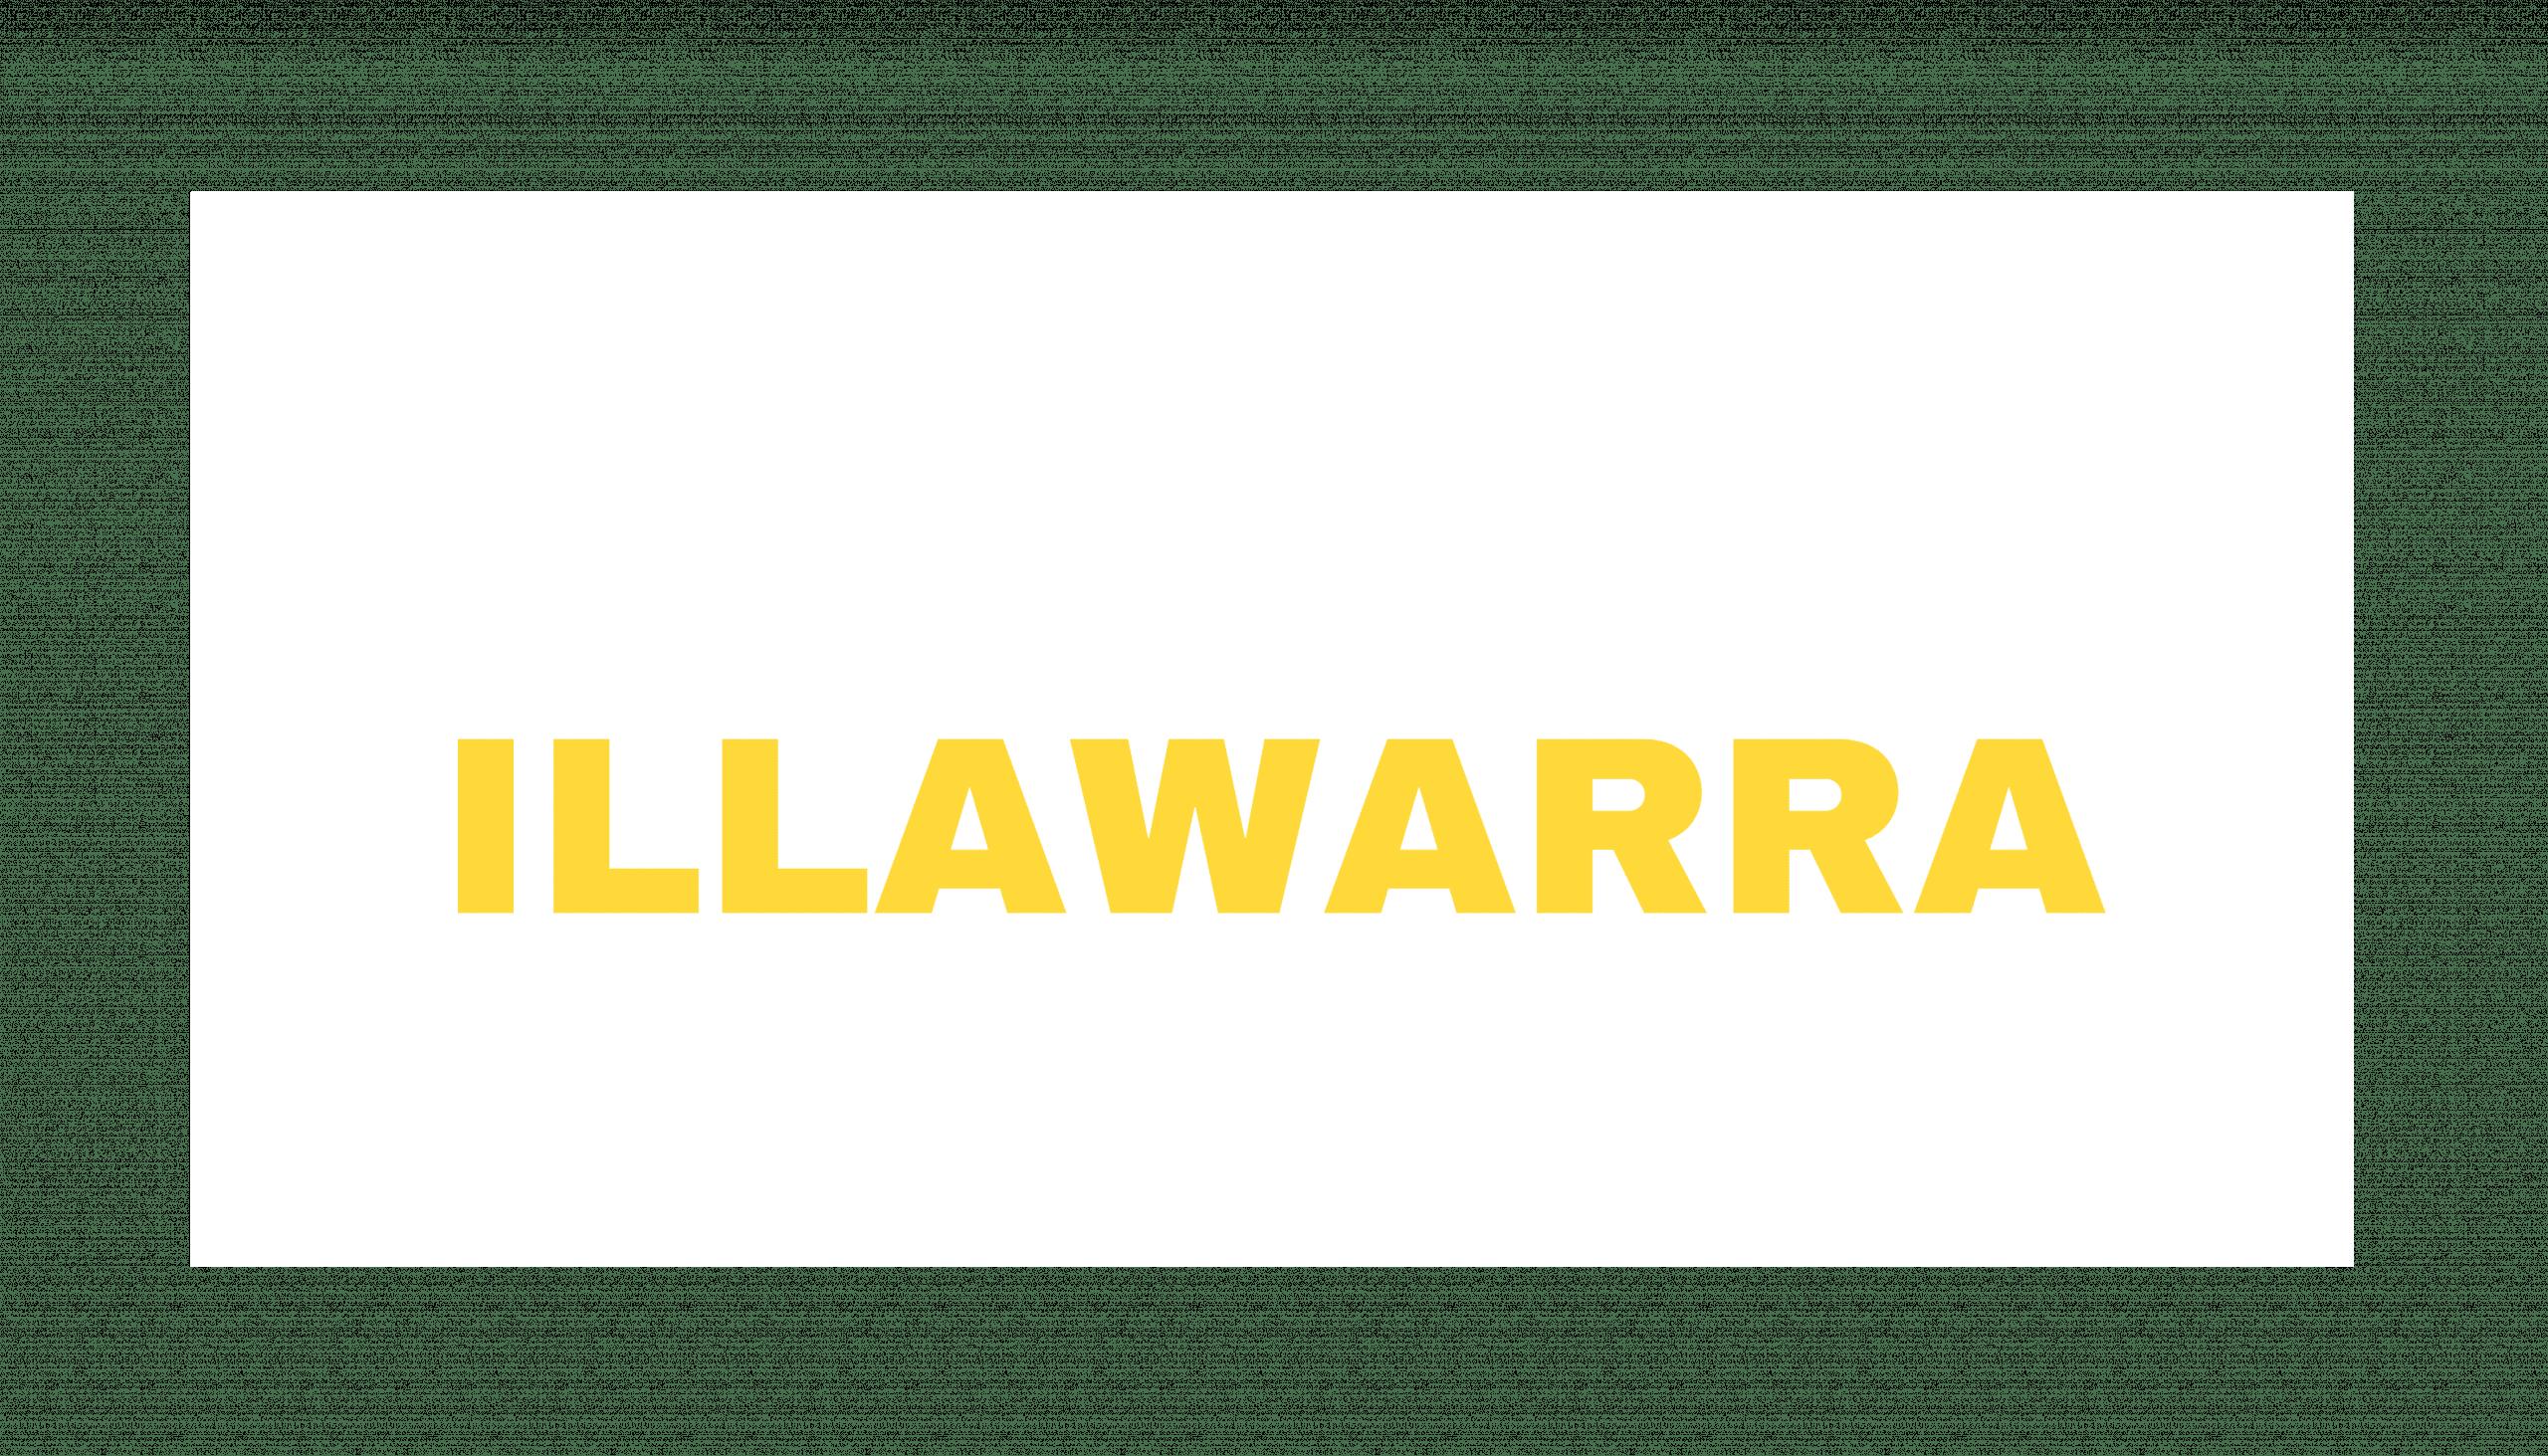 Illawarra 491 skilled occupation list